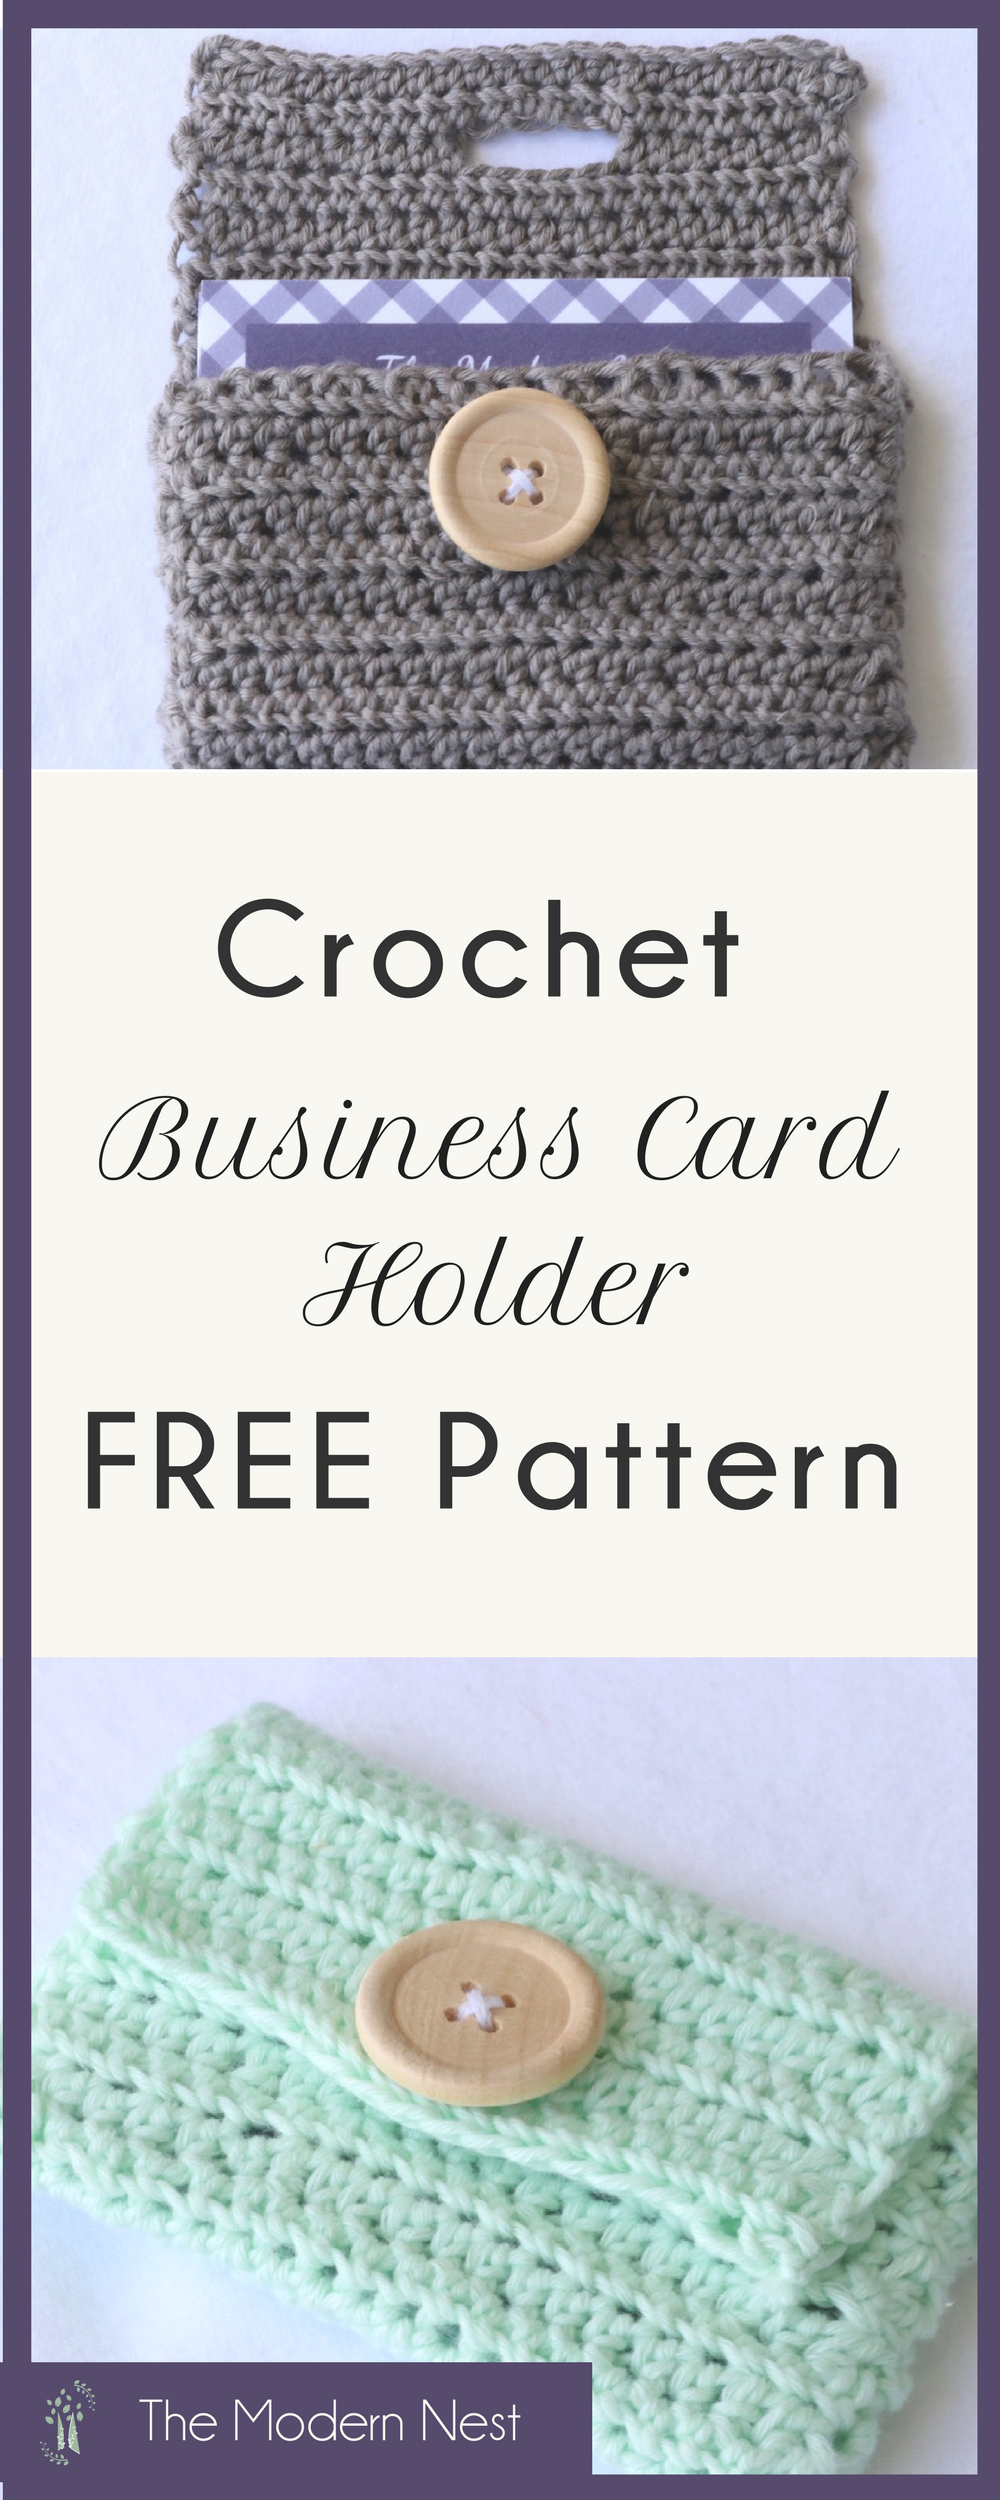 Business Card Holder Crochet Pattern | Ideas artesanales, Artesanal ...